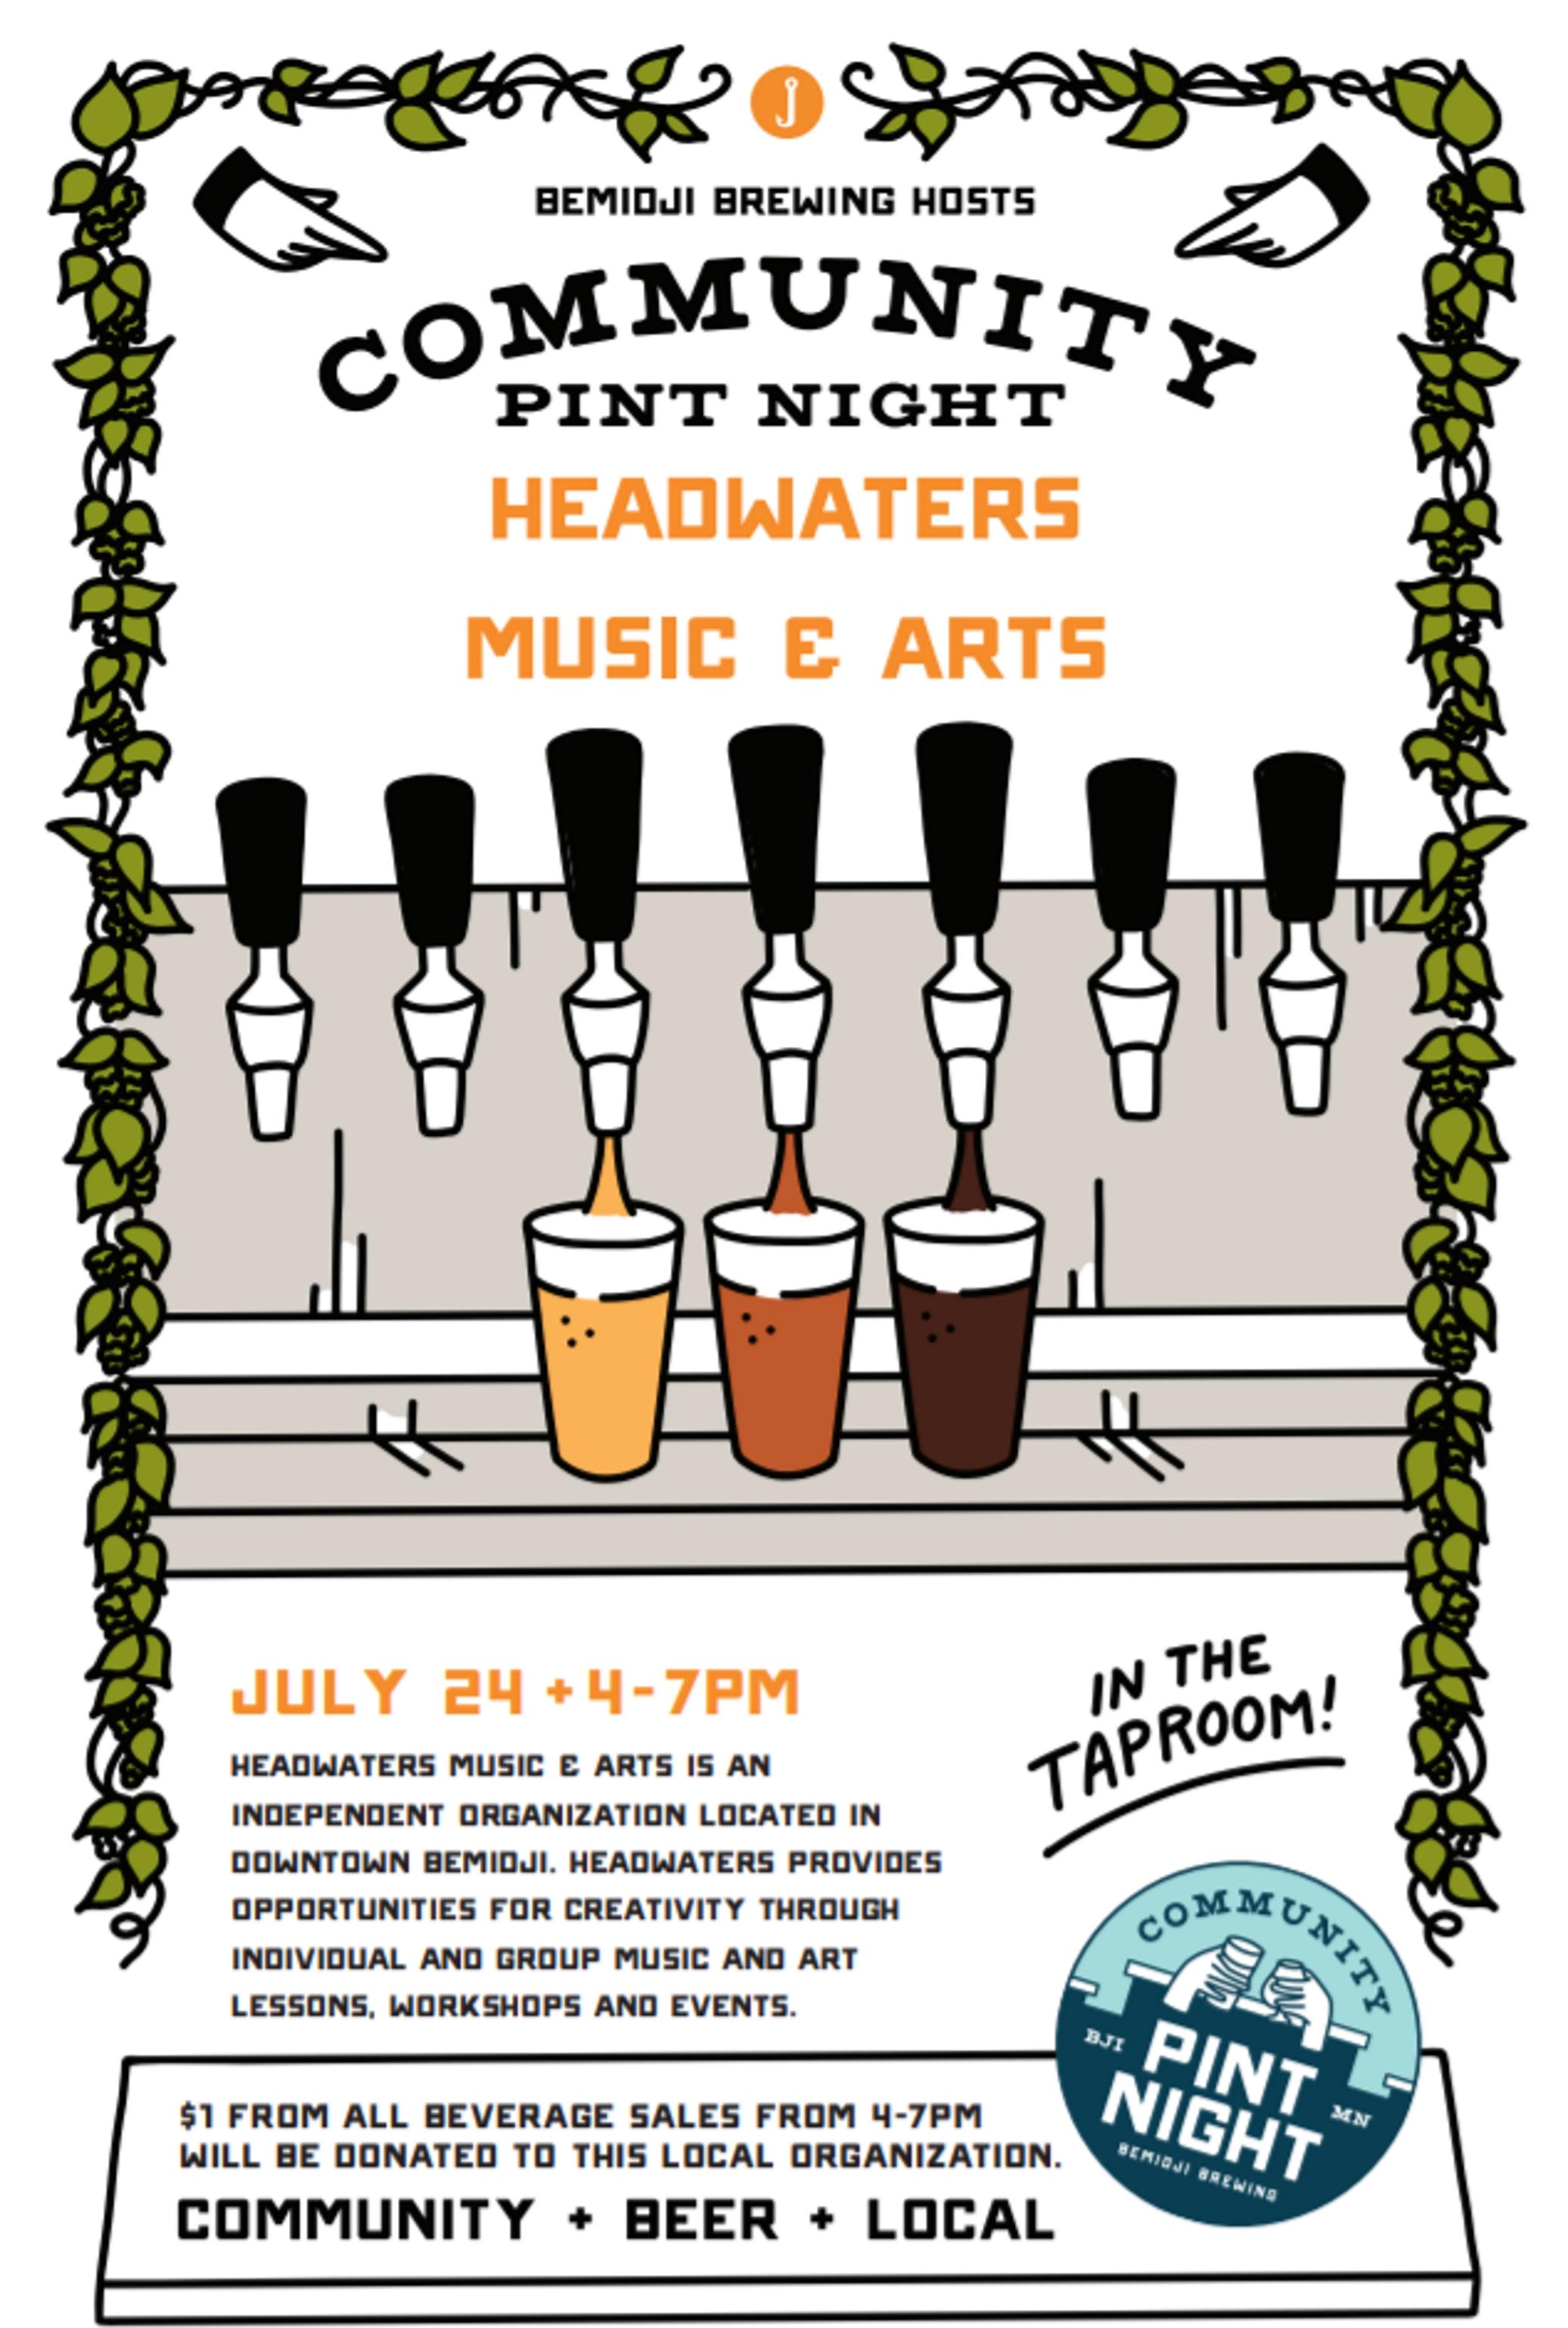 Community Pint Night @ Bemidji Brewing | Bemidji | Minnesota | United States